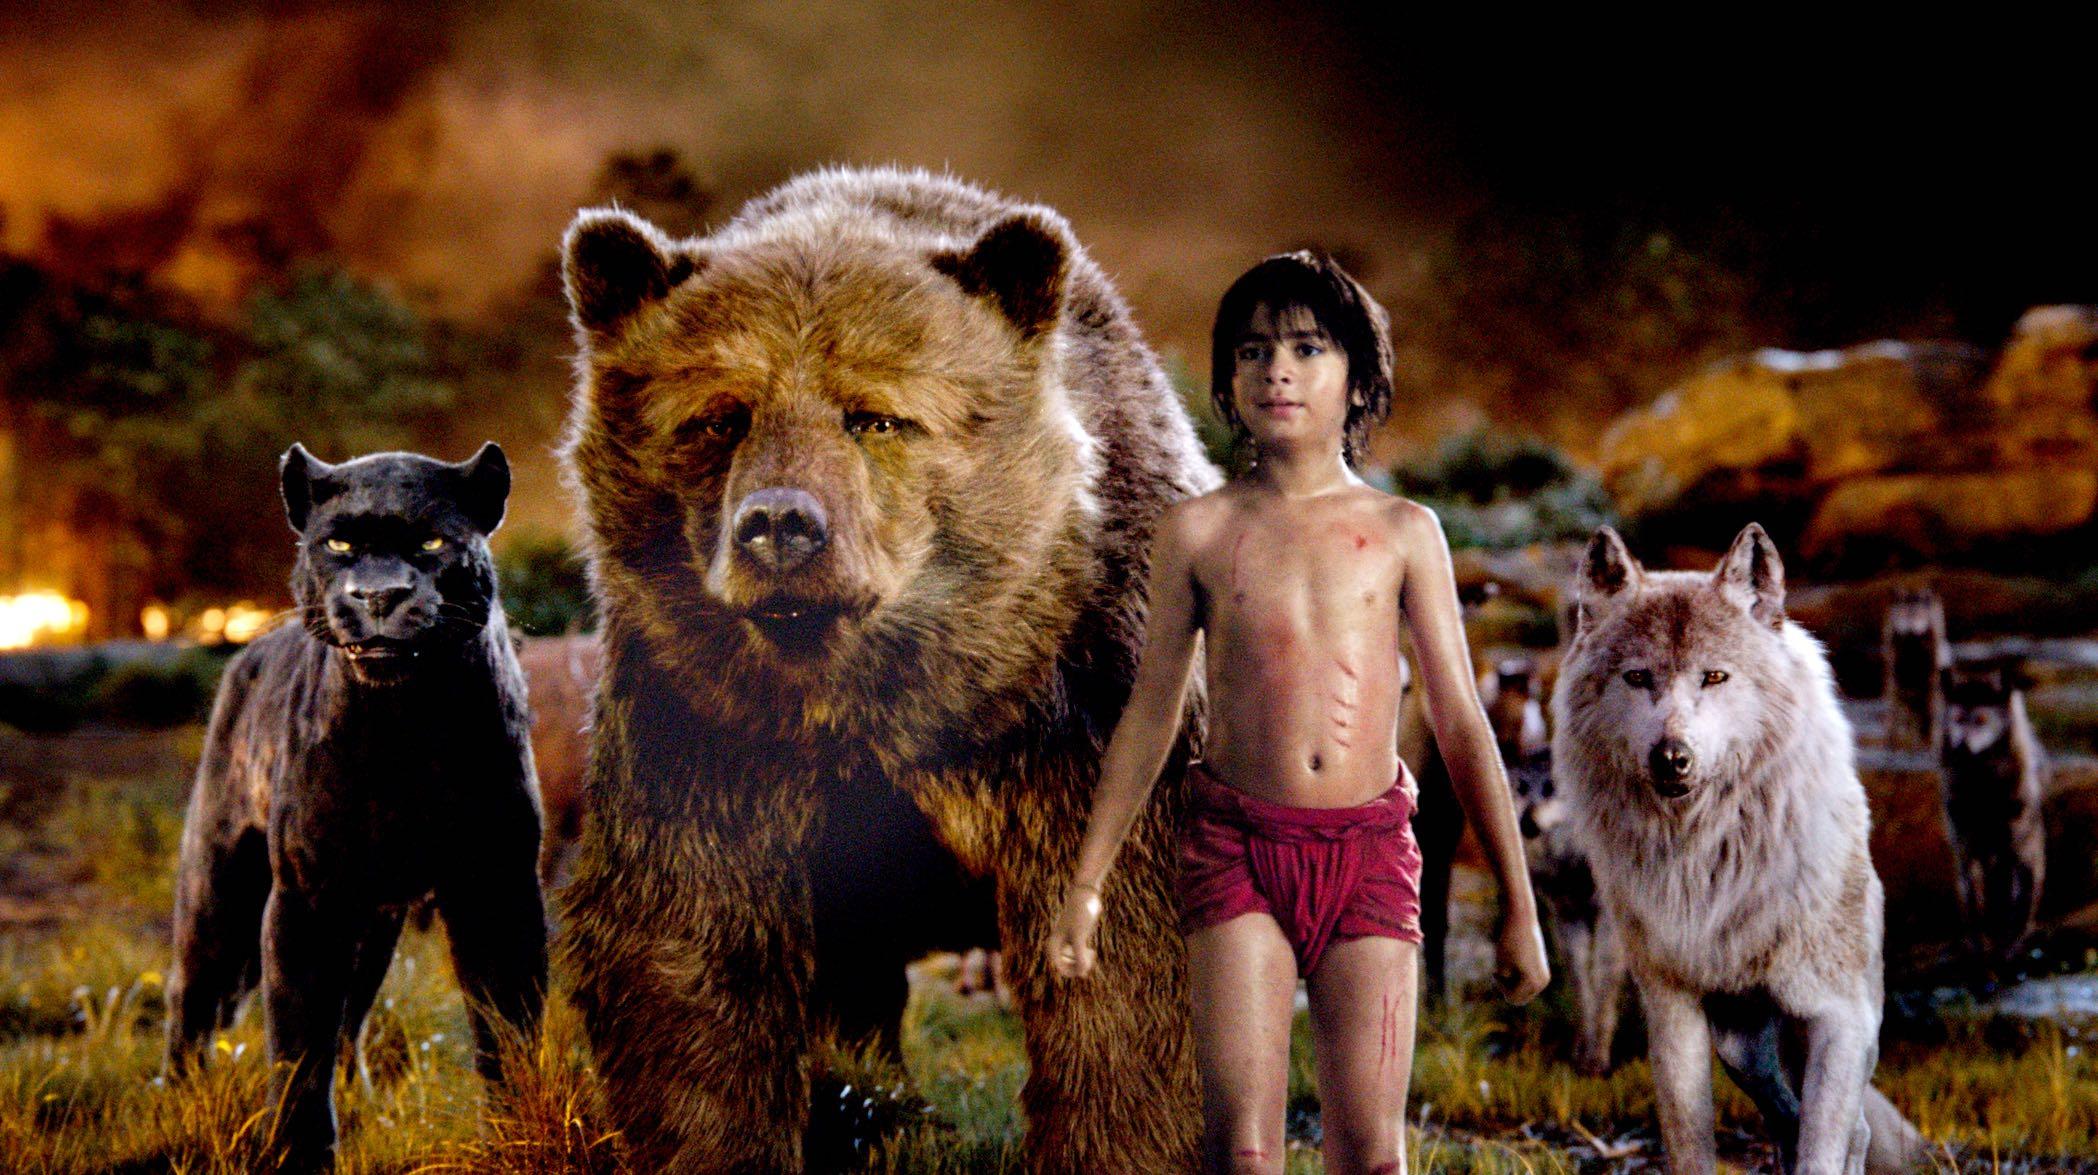 'The Jungle Book'